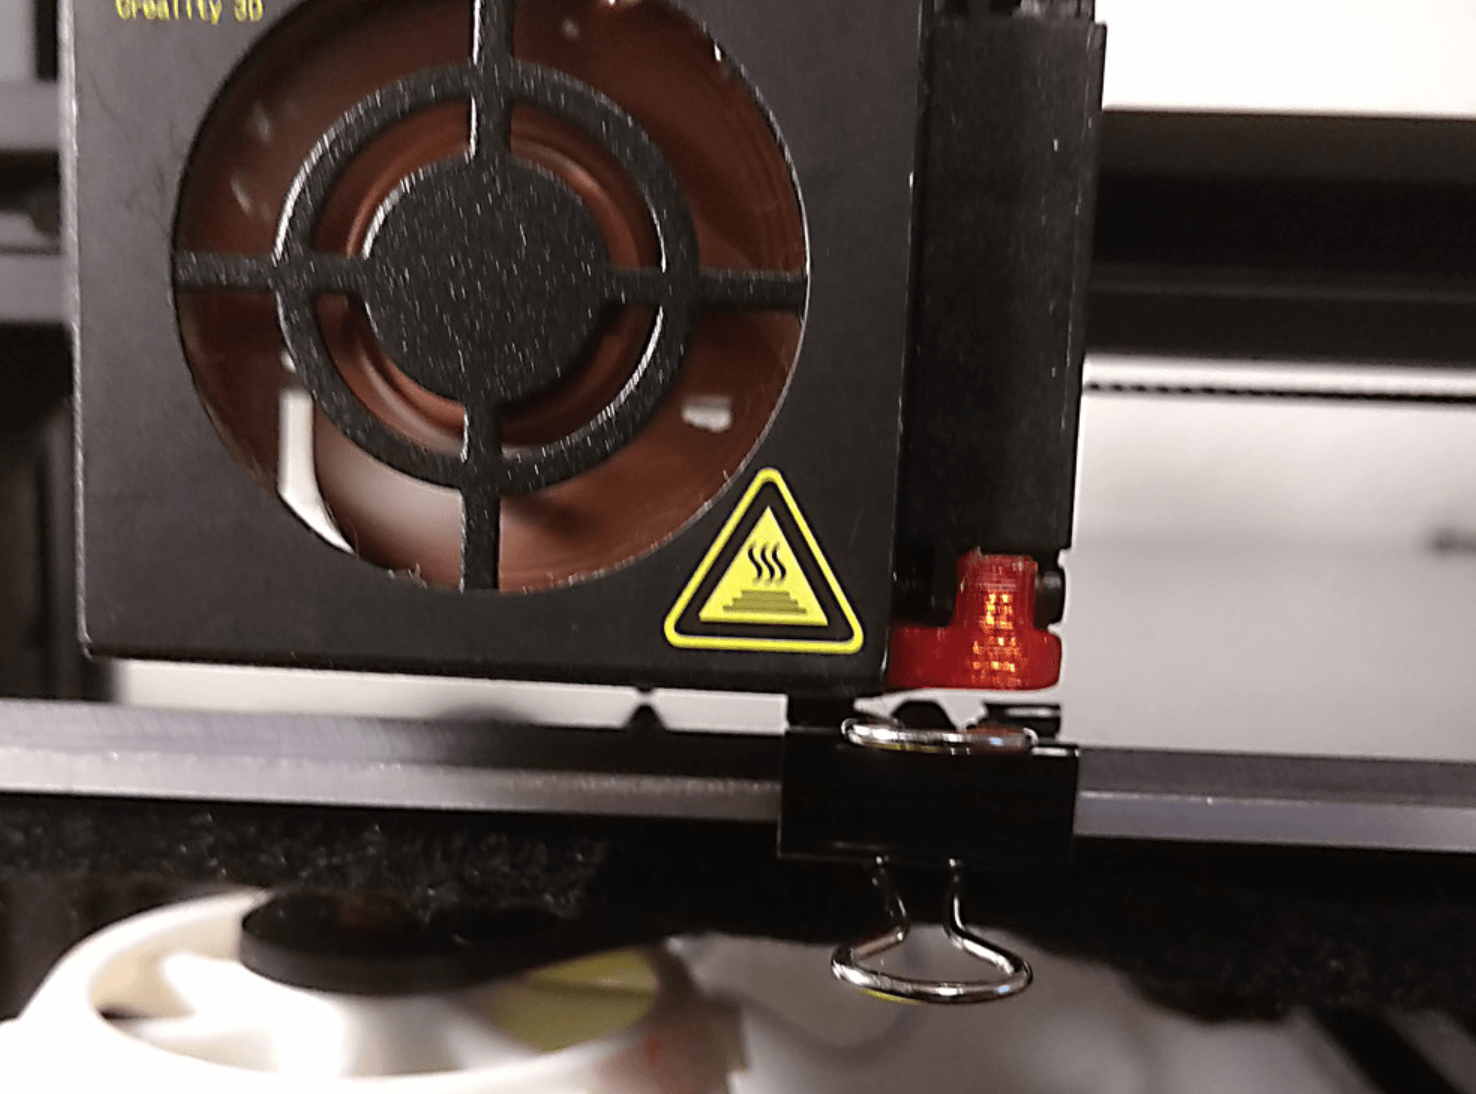 Capture d'écran 2018-05-02 à 14.26.24.png Download free STL file CR-10S, OEM Fan, Offset Nozzle with Clip Clearance • 3D print object, johnmcwgeo